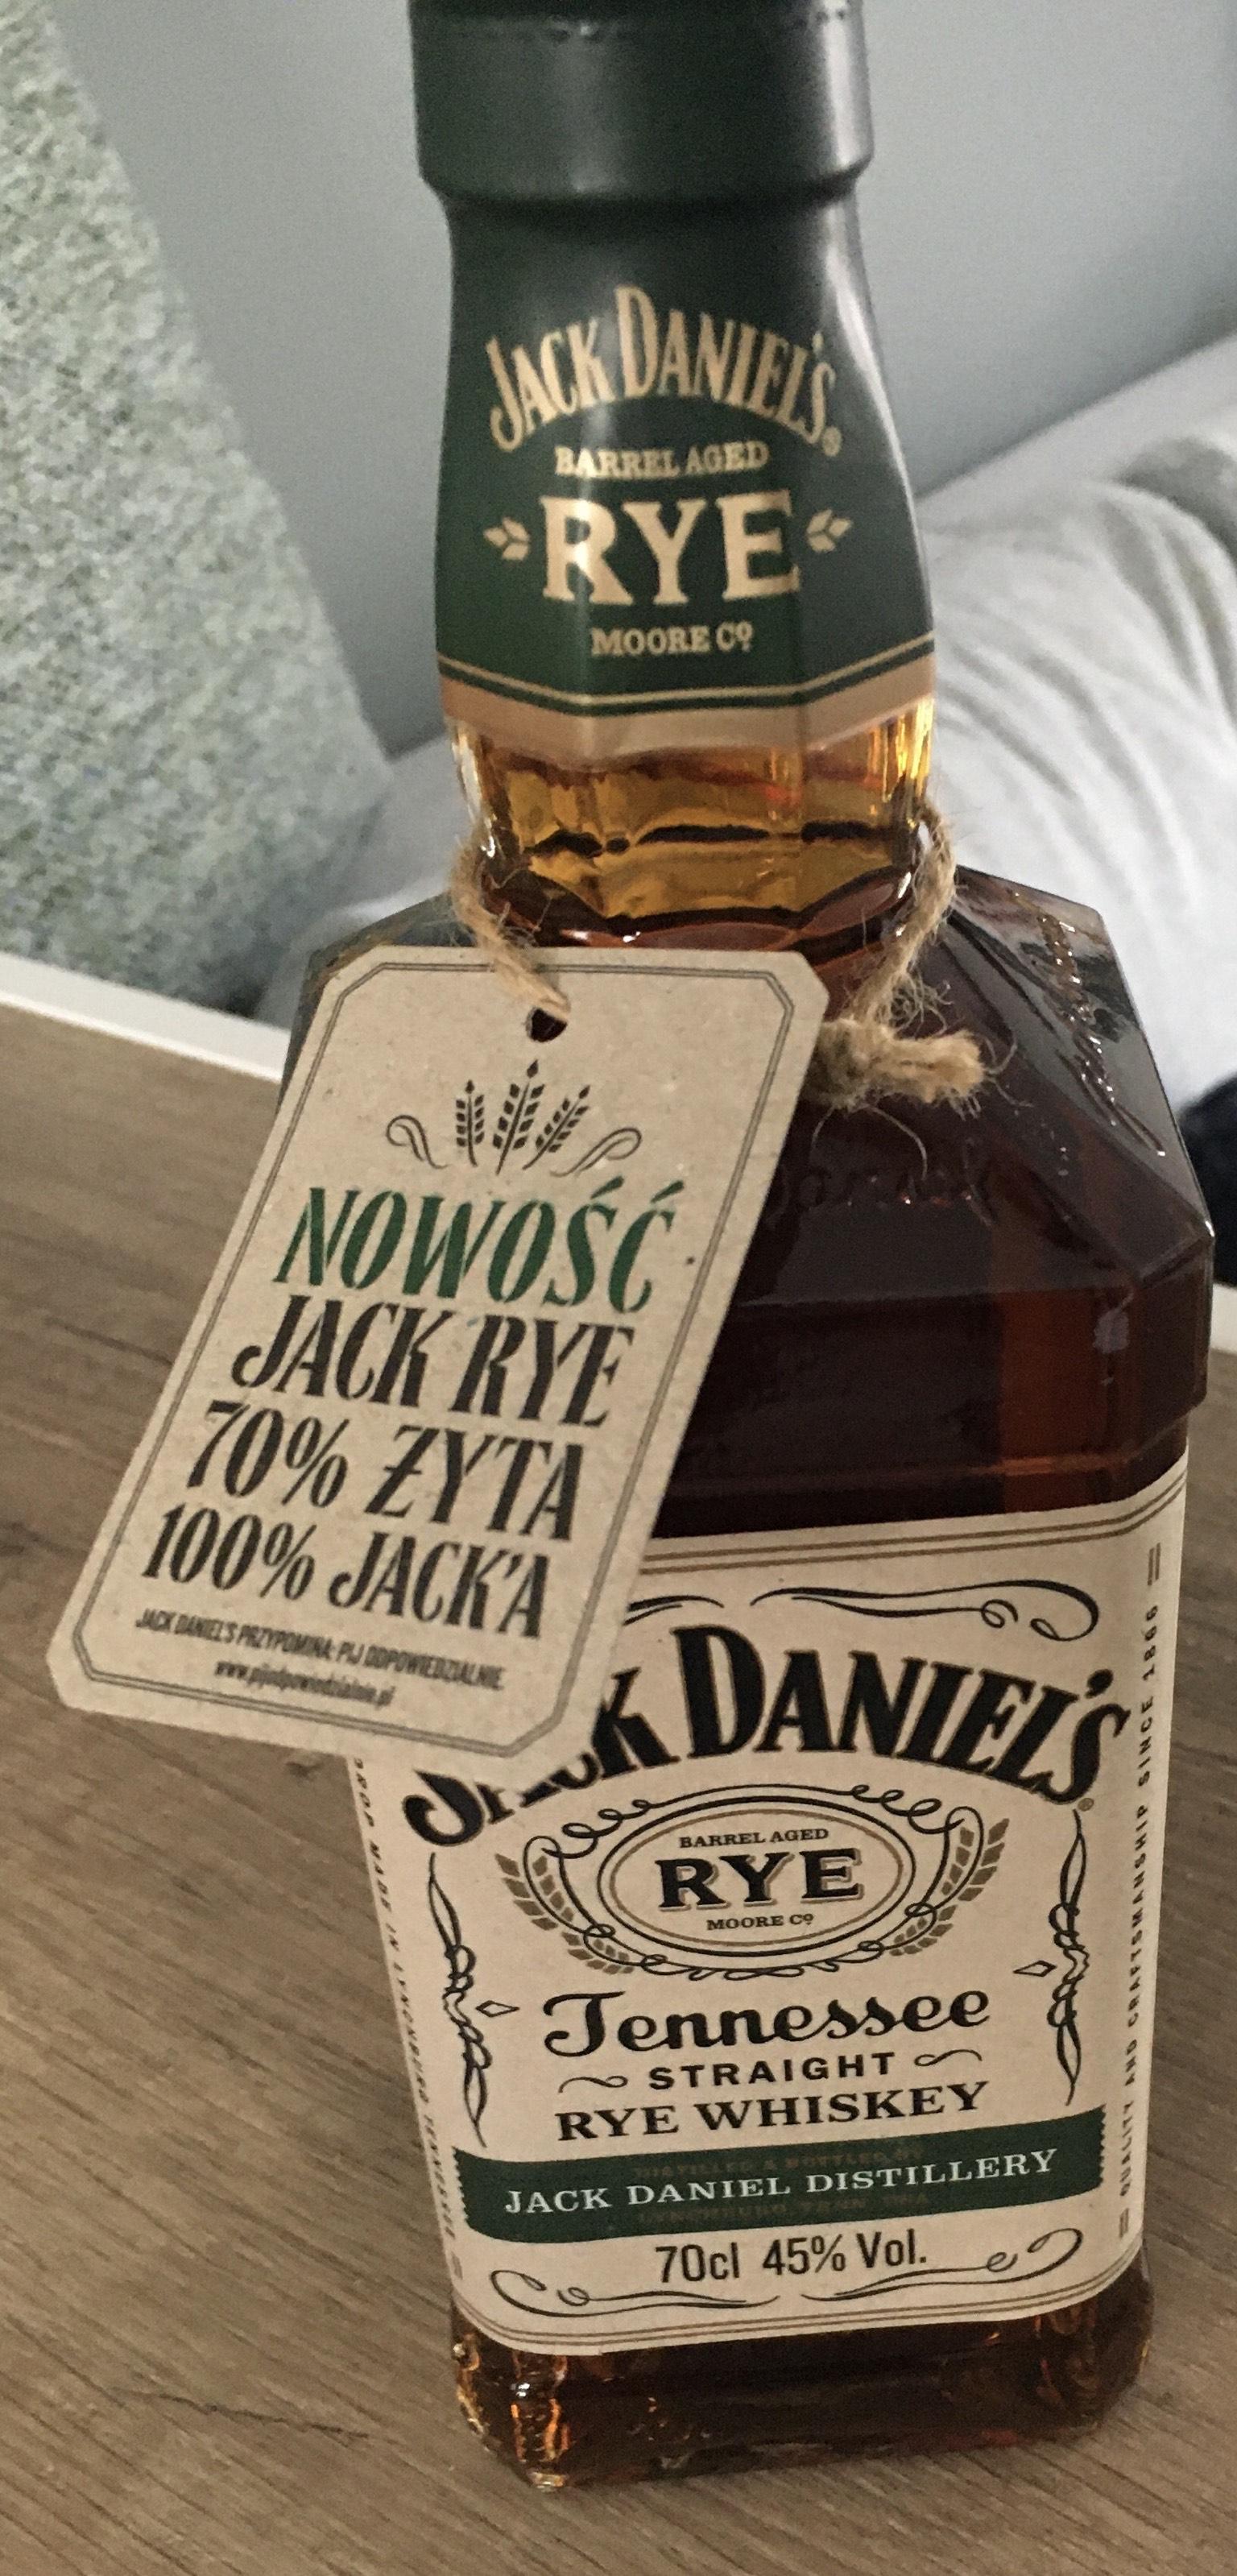 Jack Daniels Straight Rye Whiskey @ Carrefour